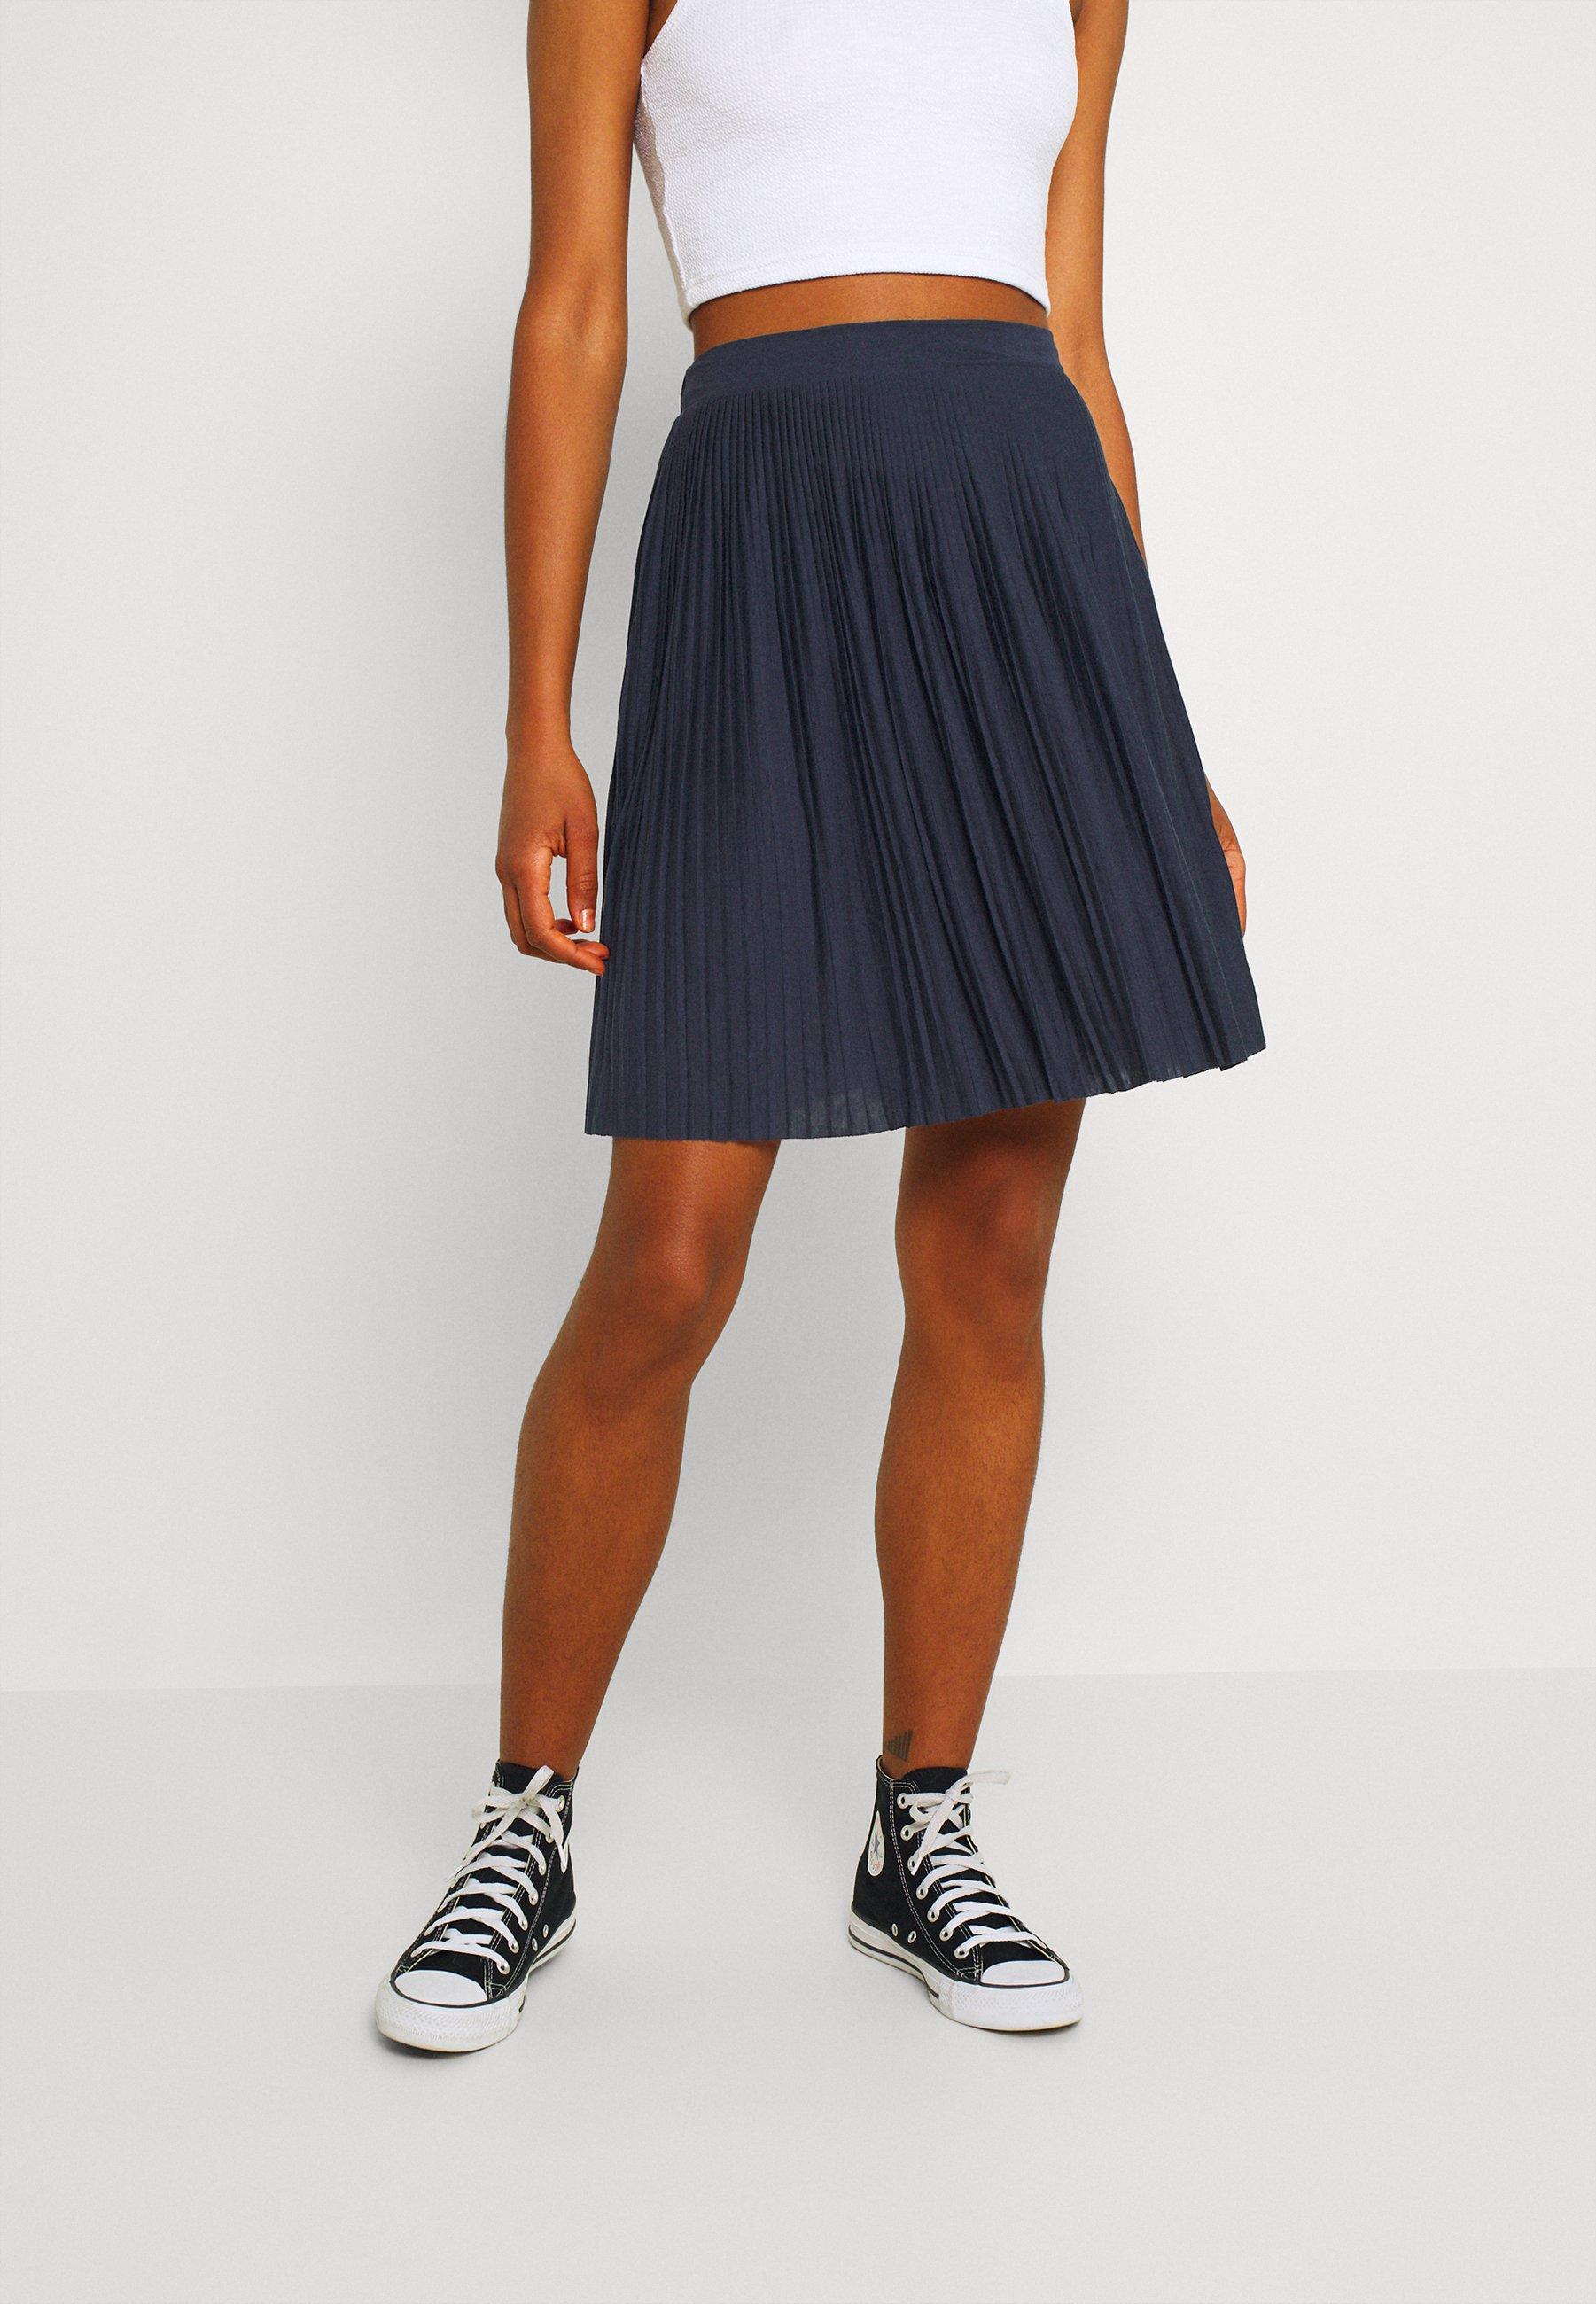 Femme VIPLISS SKIRT - Jupe plissée